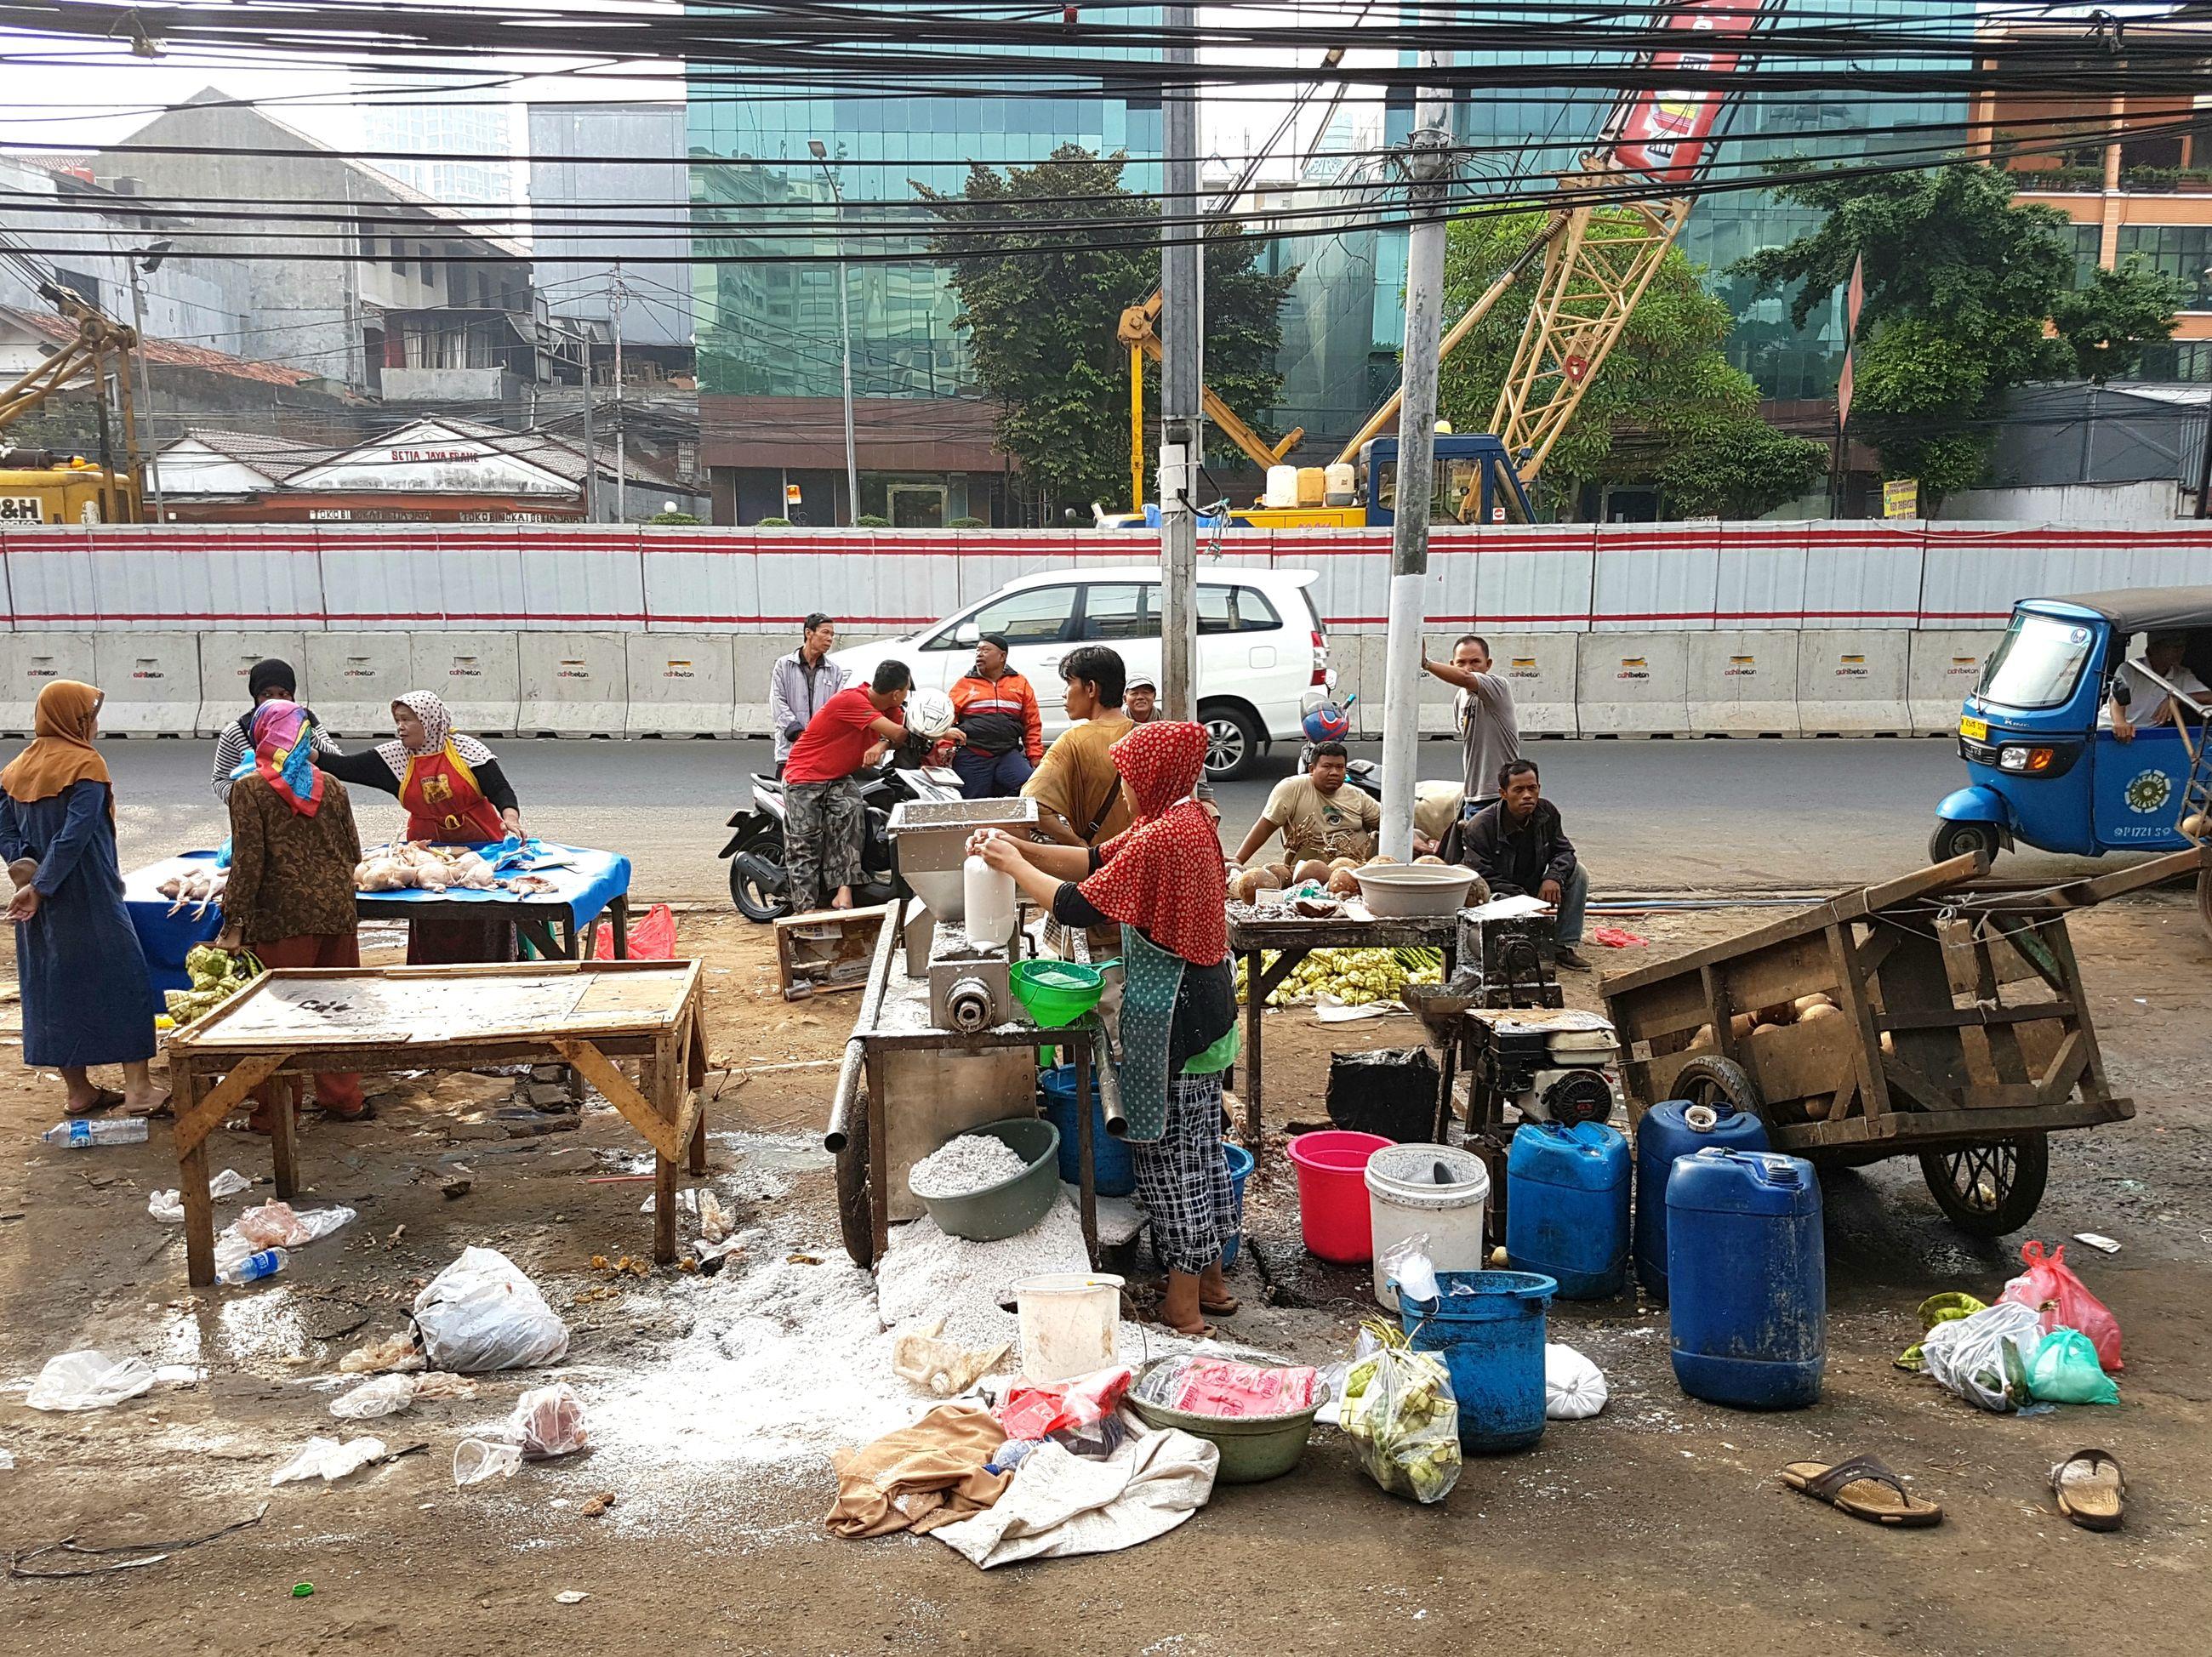 PEOPLE WORKING IN STADIUM